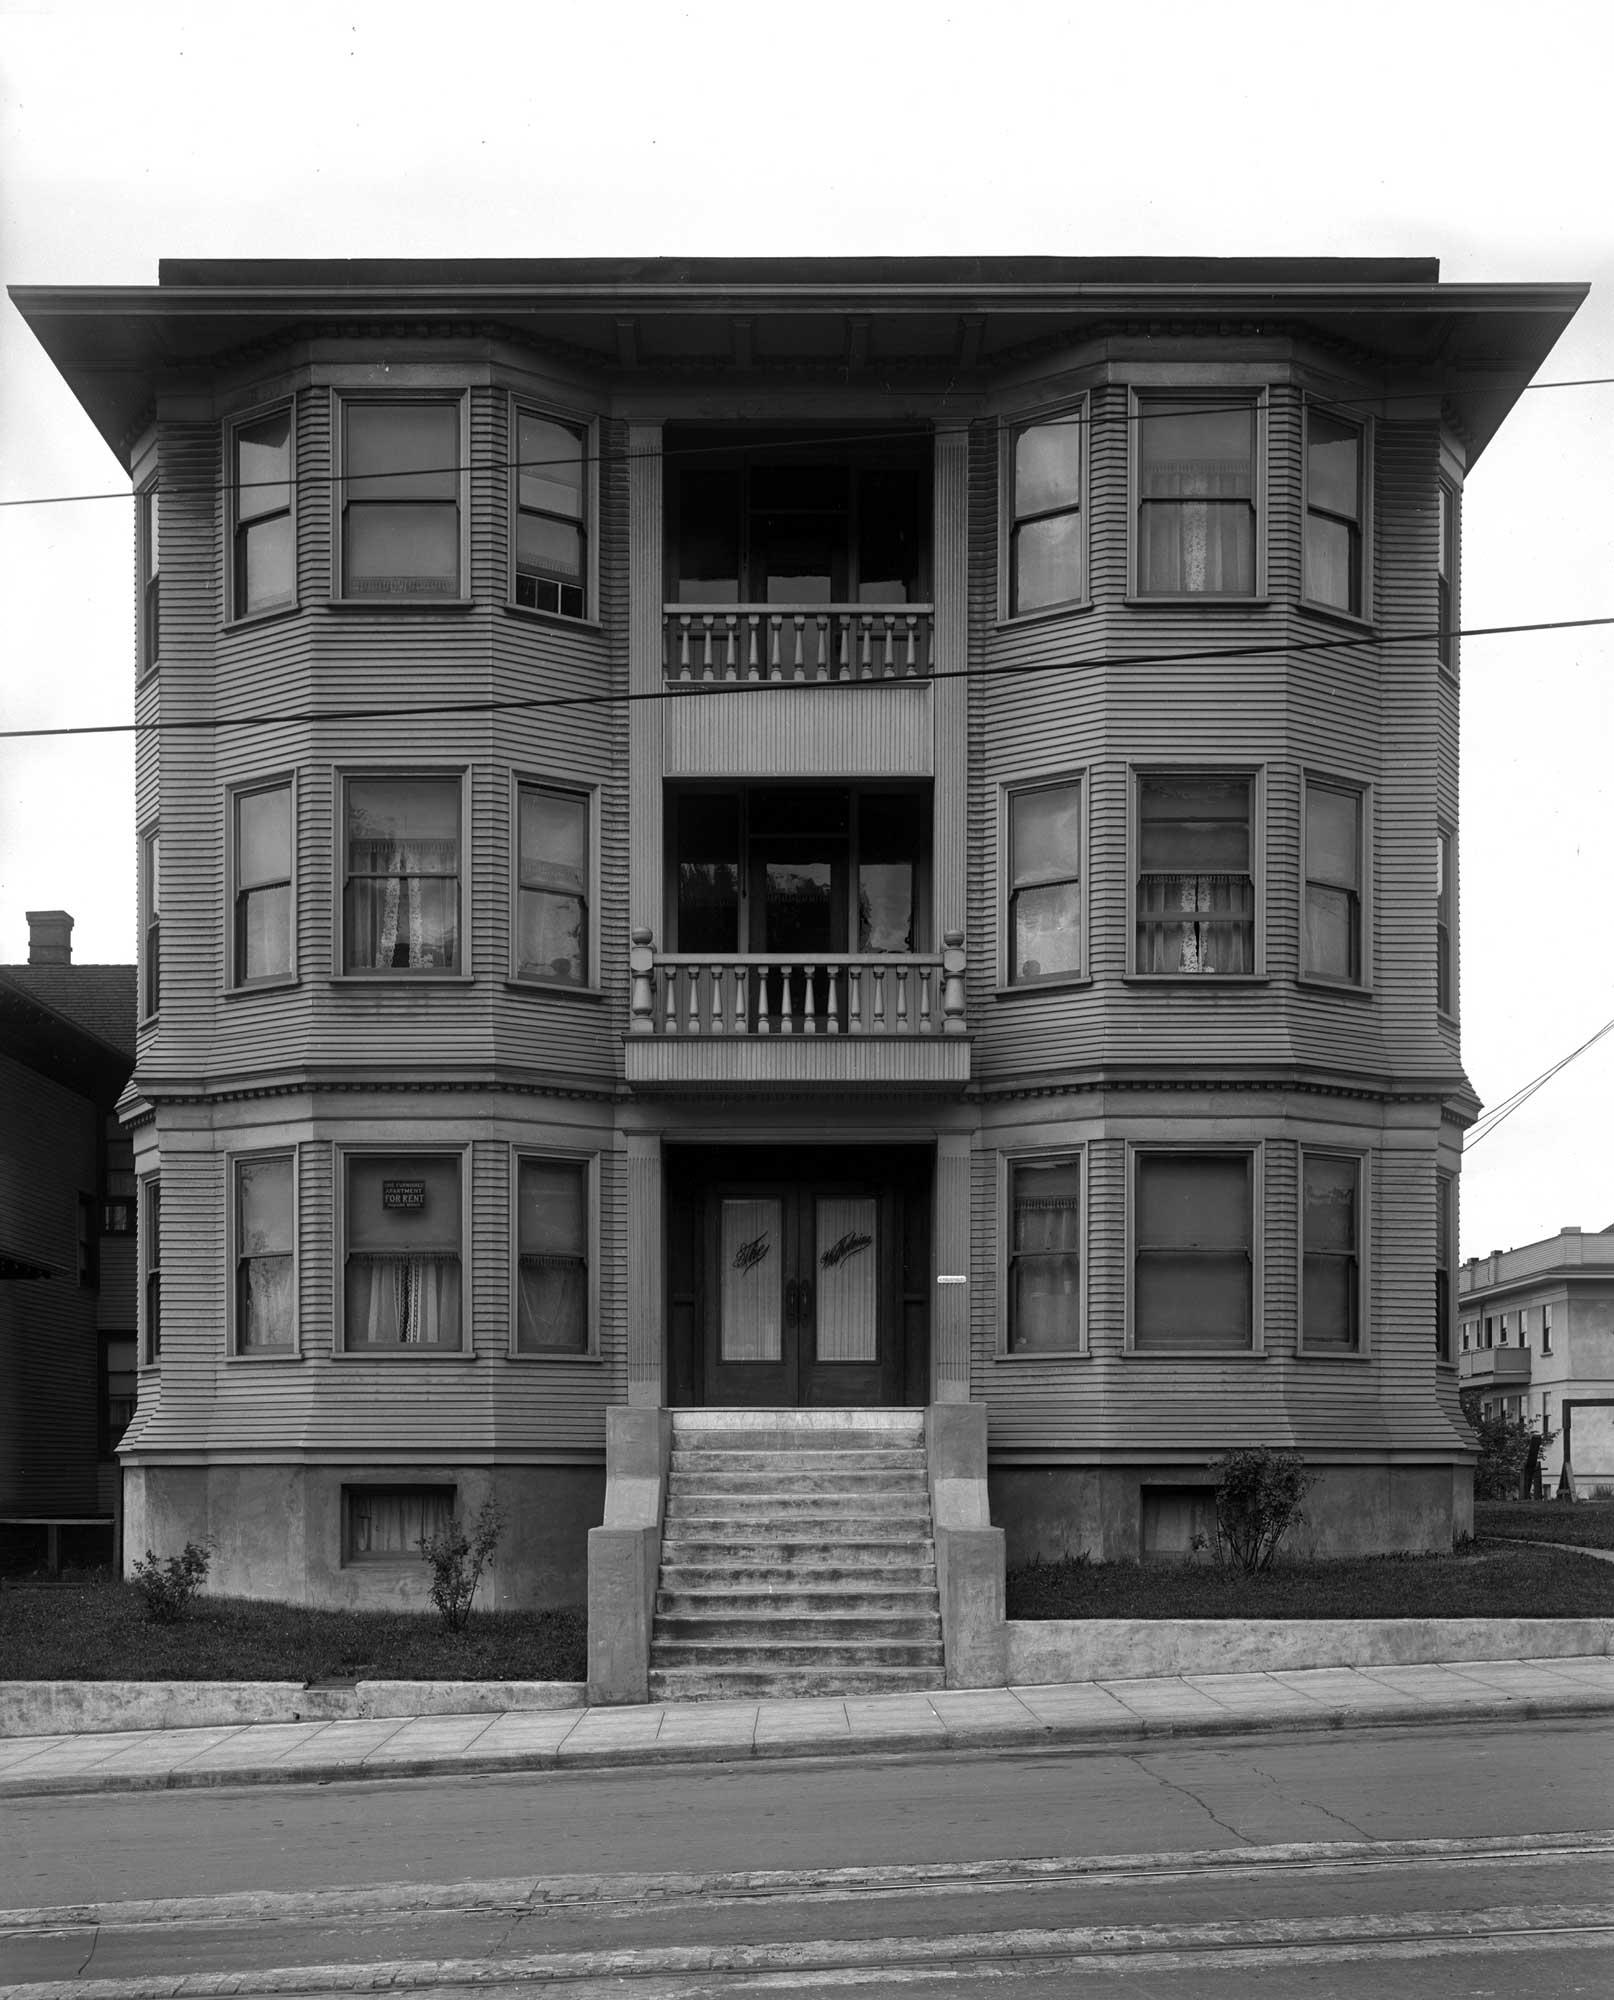 Seattle Apartments: The-Wilhelmina-Apt-mr-THEN